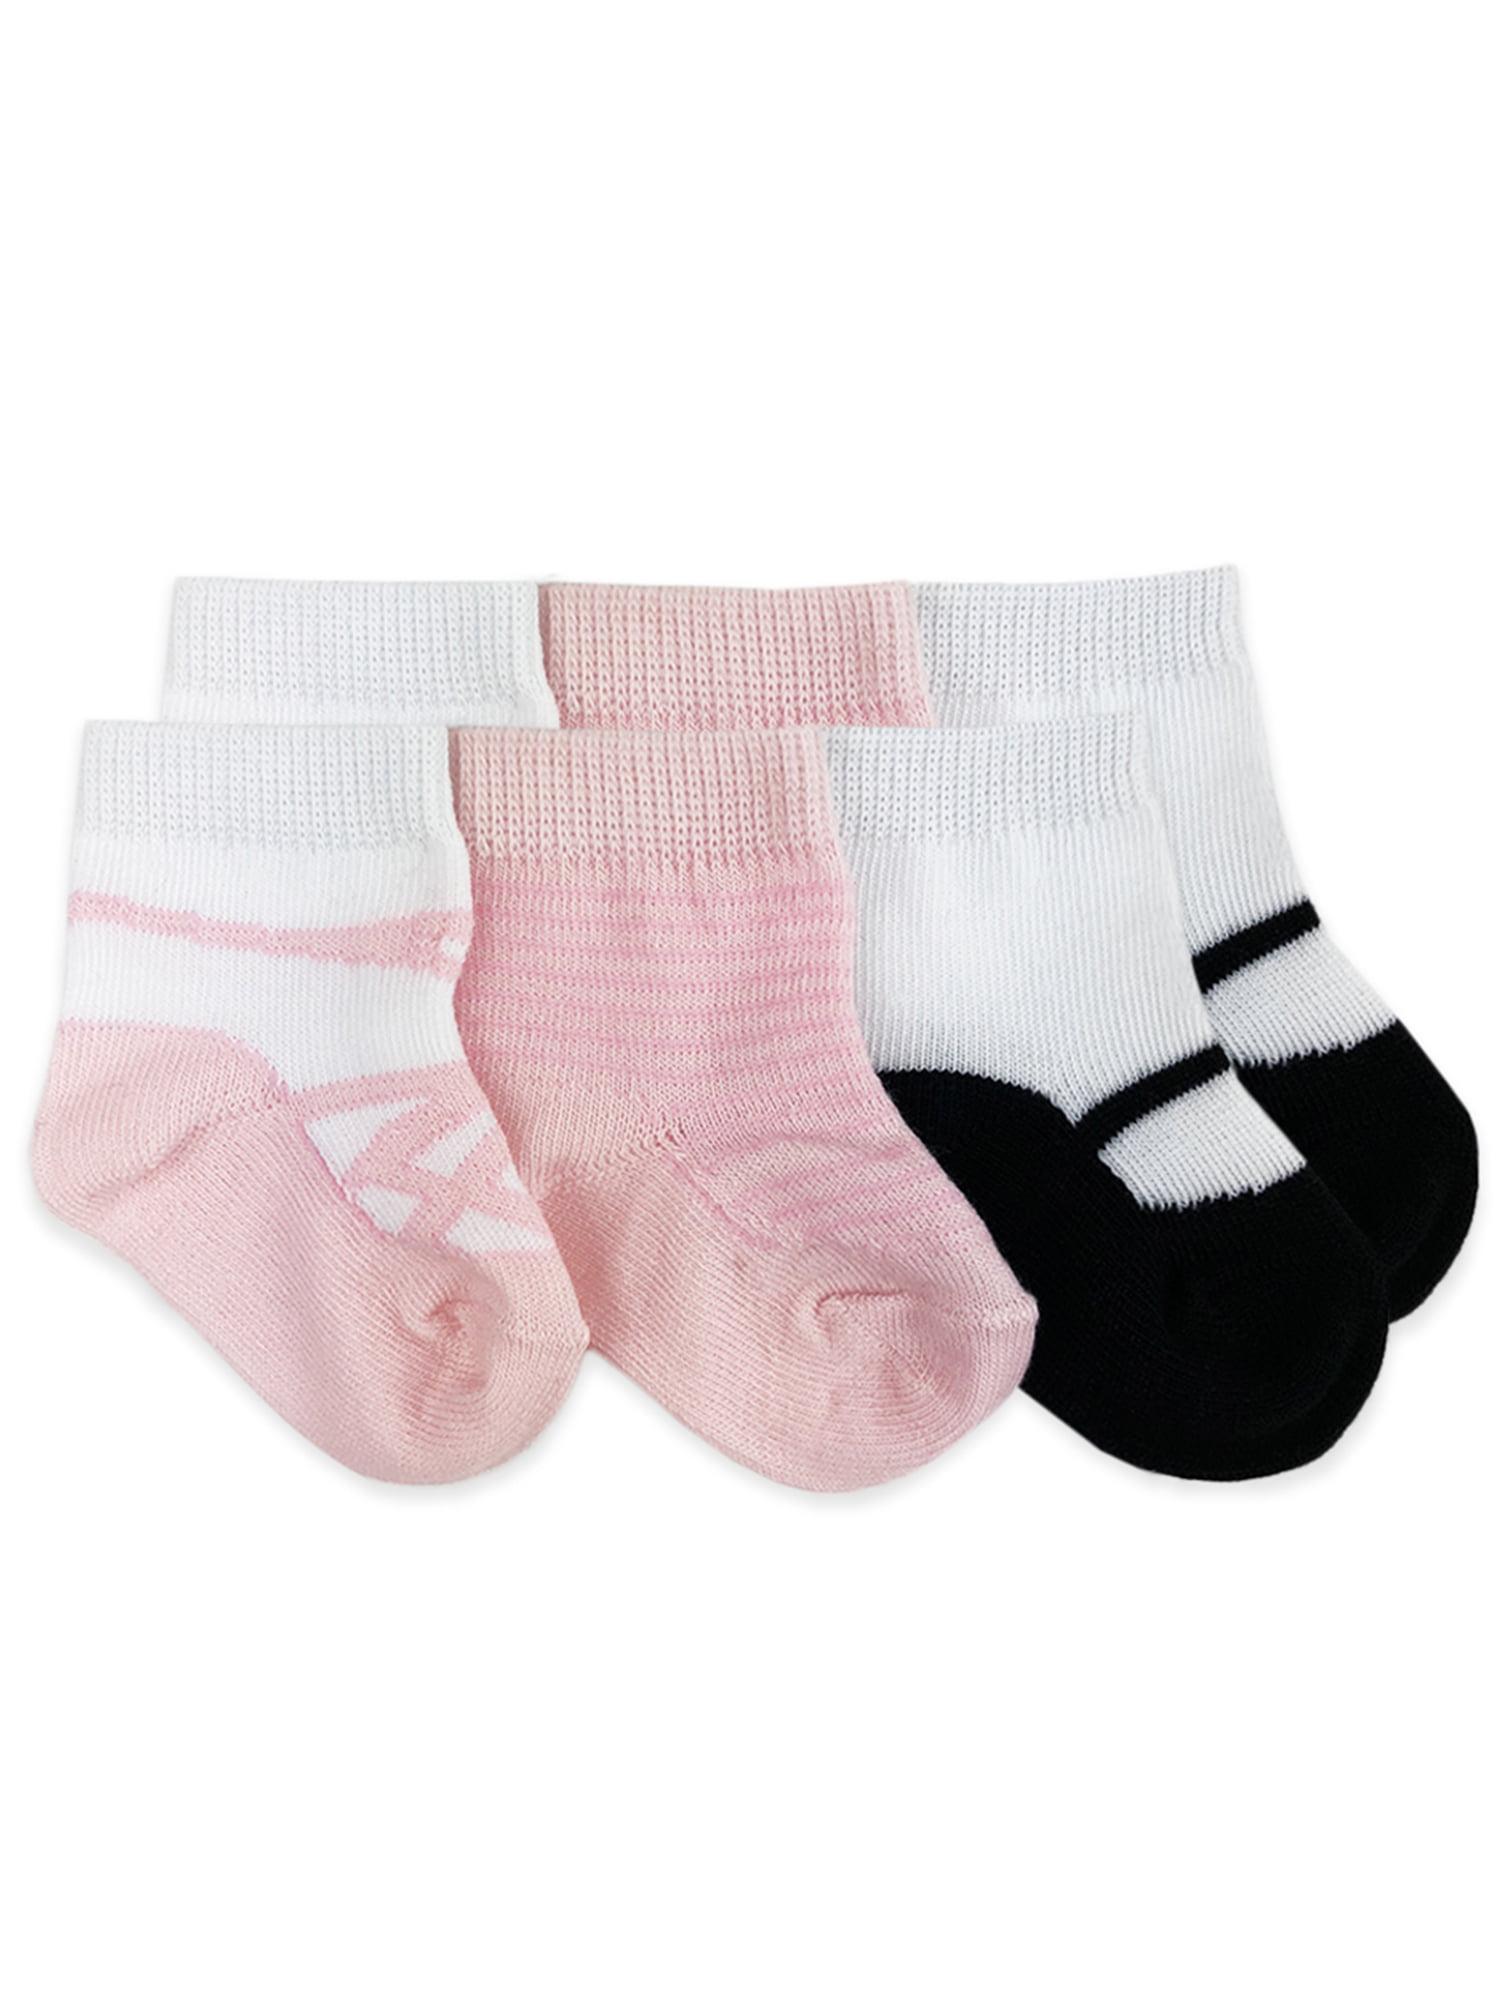 Pro1rise 6 Pairs Toddler Baby Boys Antislip Skid Sneakers Shoe Socks Age 12-24 M